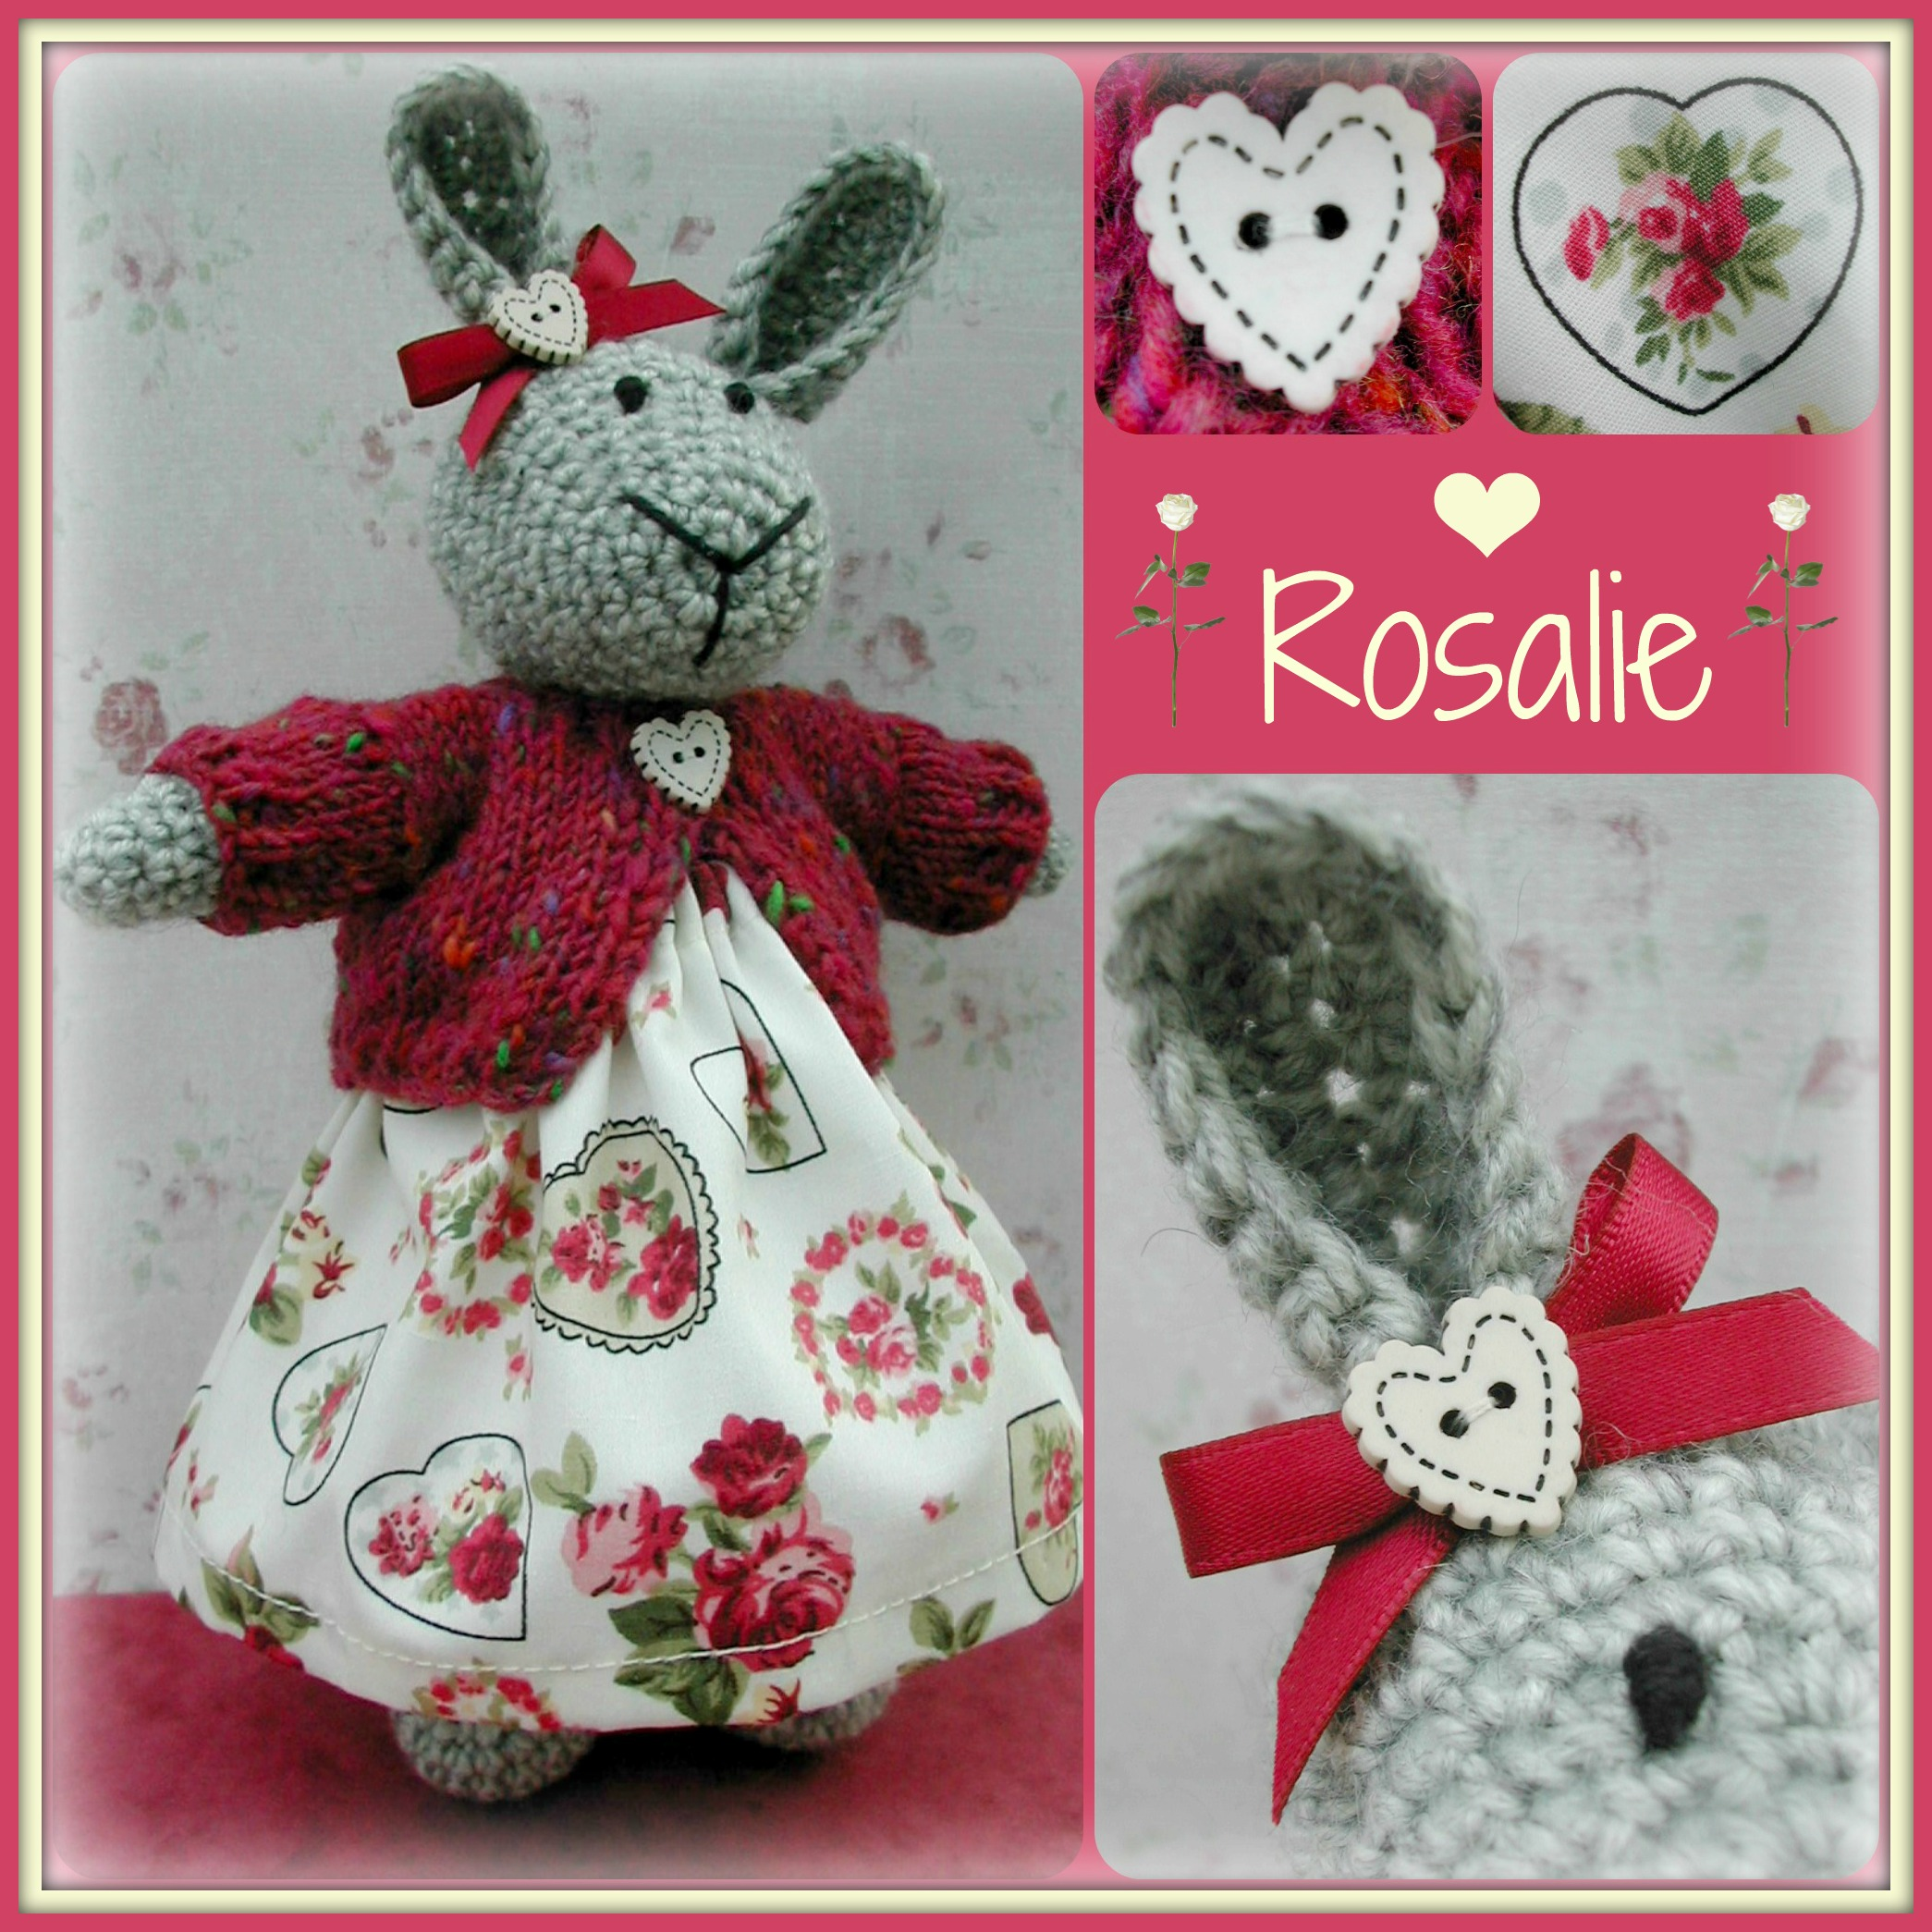 Rosalie Collage